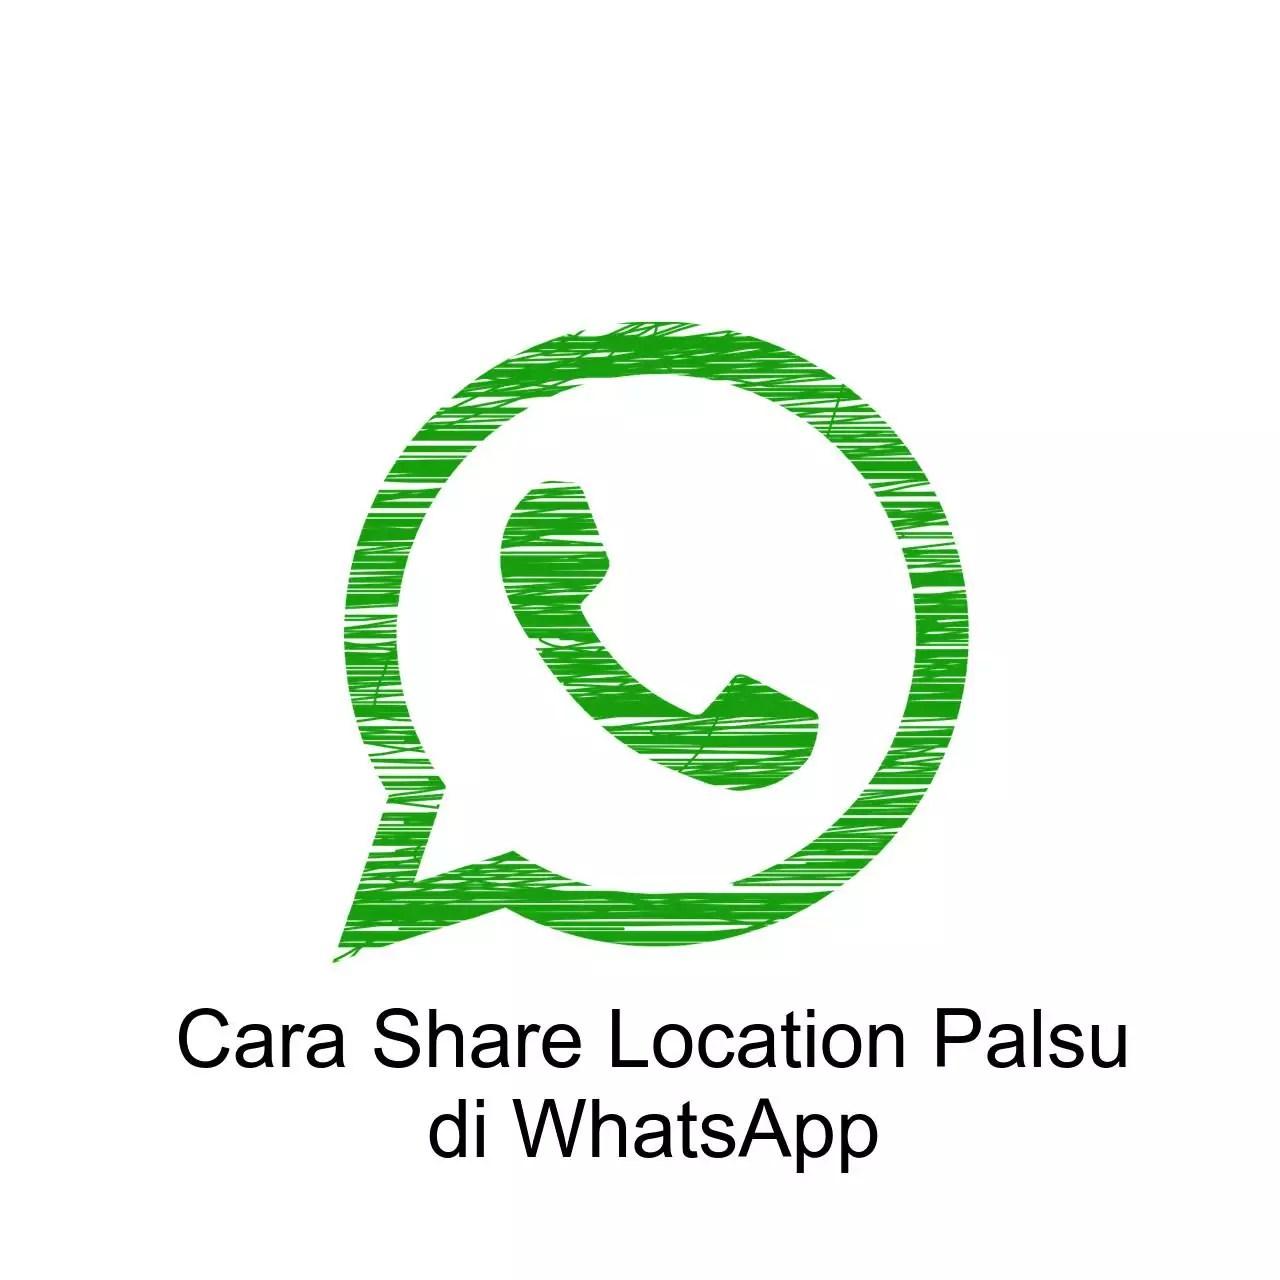 cara mengirim share location palsu di Whatsapp